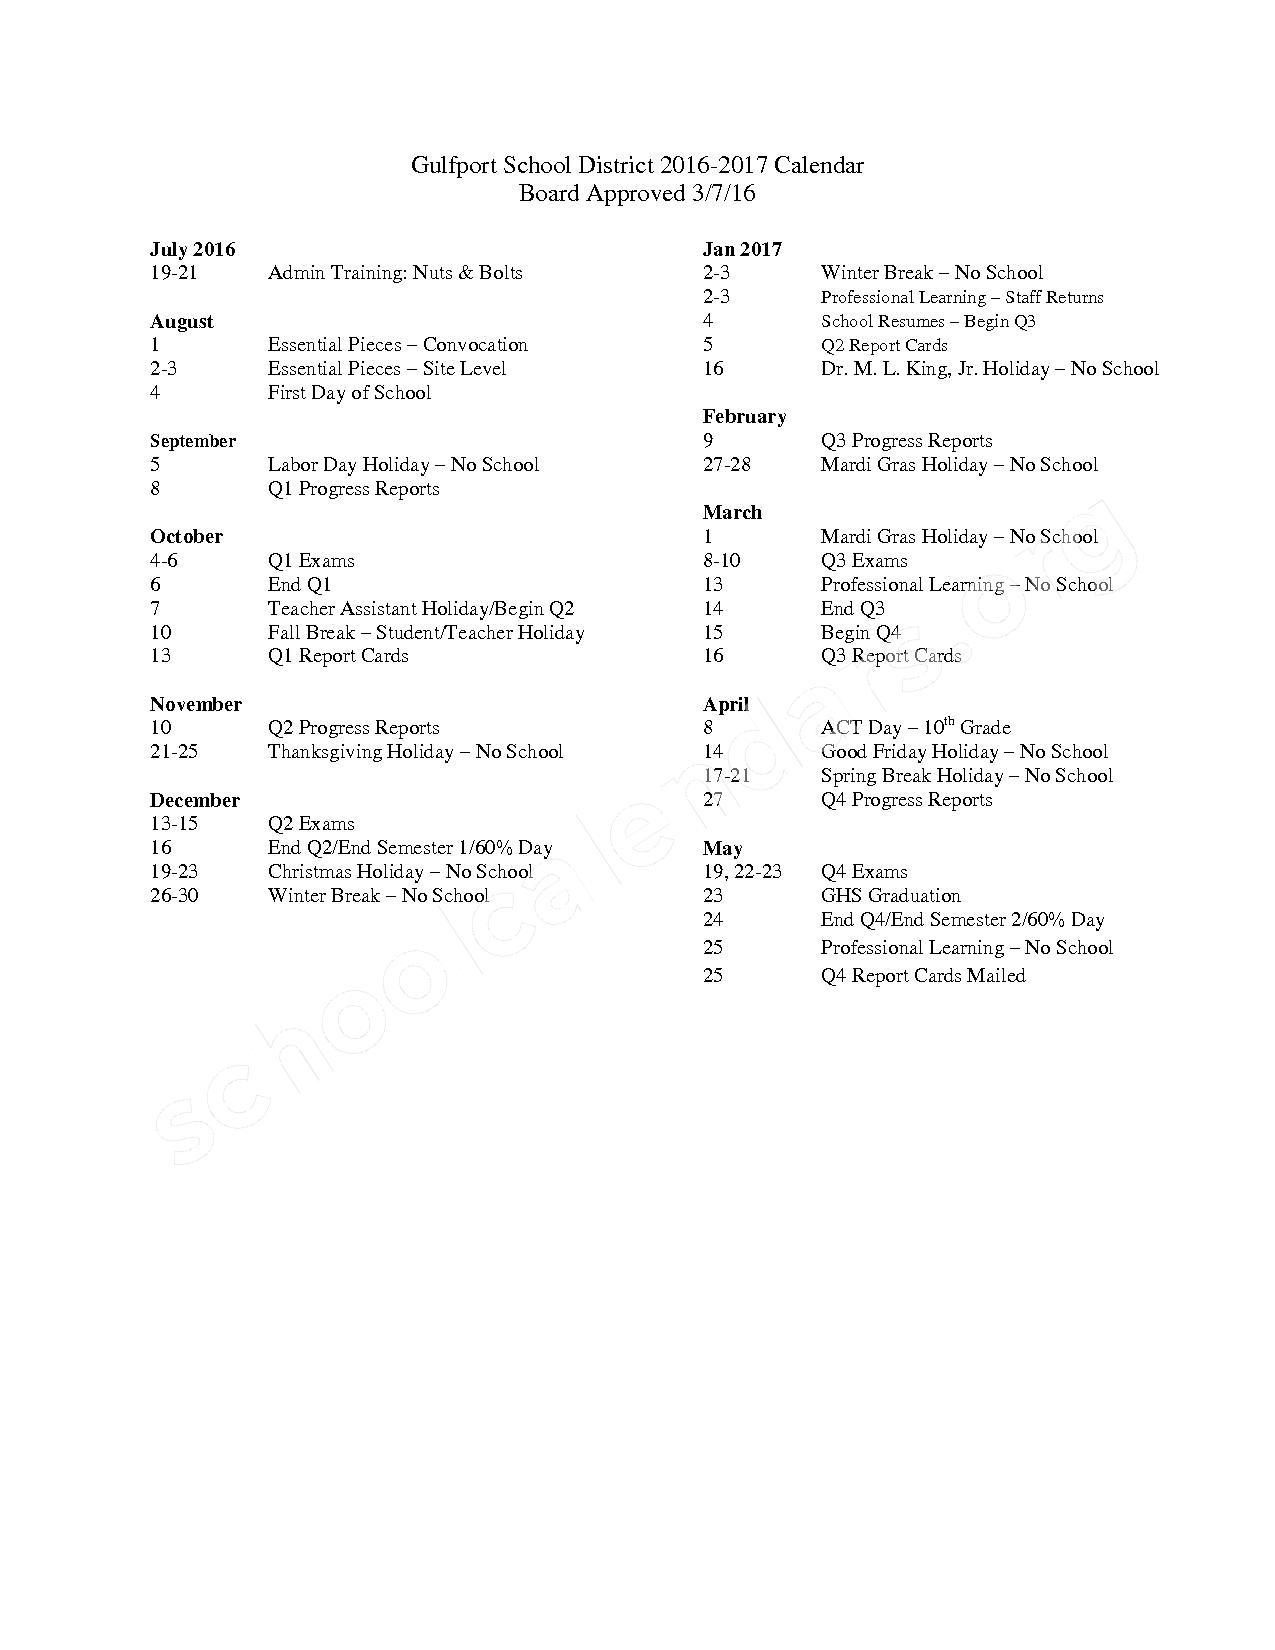 2016 - 2017 School Calendar – Central Elementary School – page 1